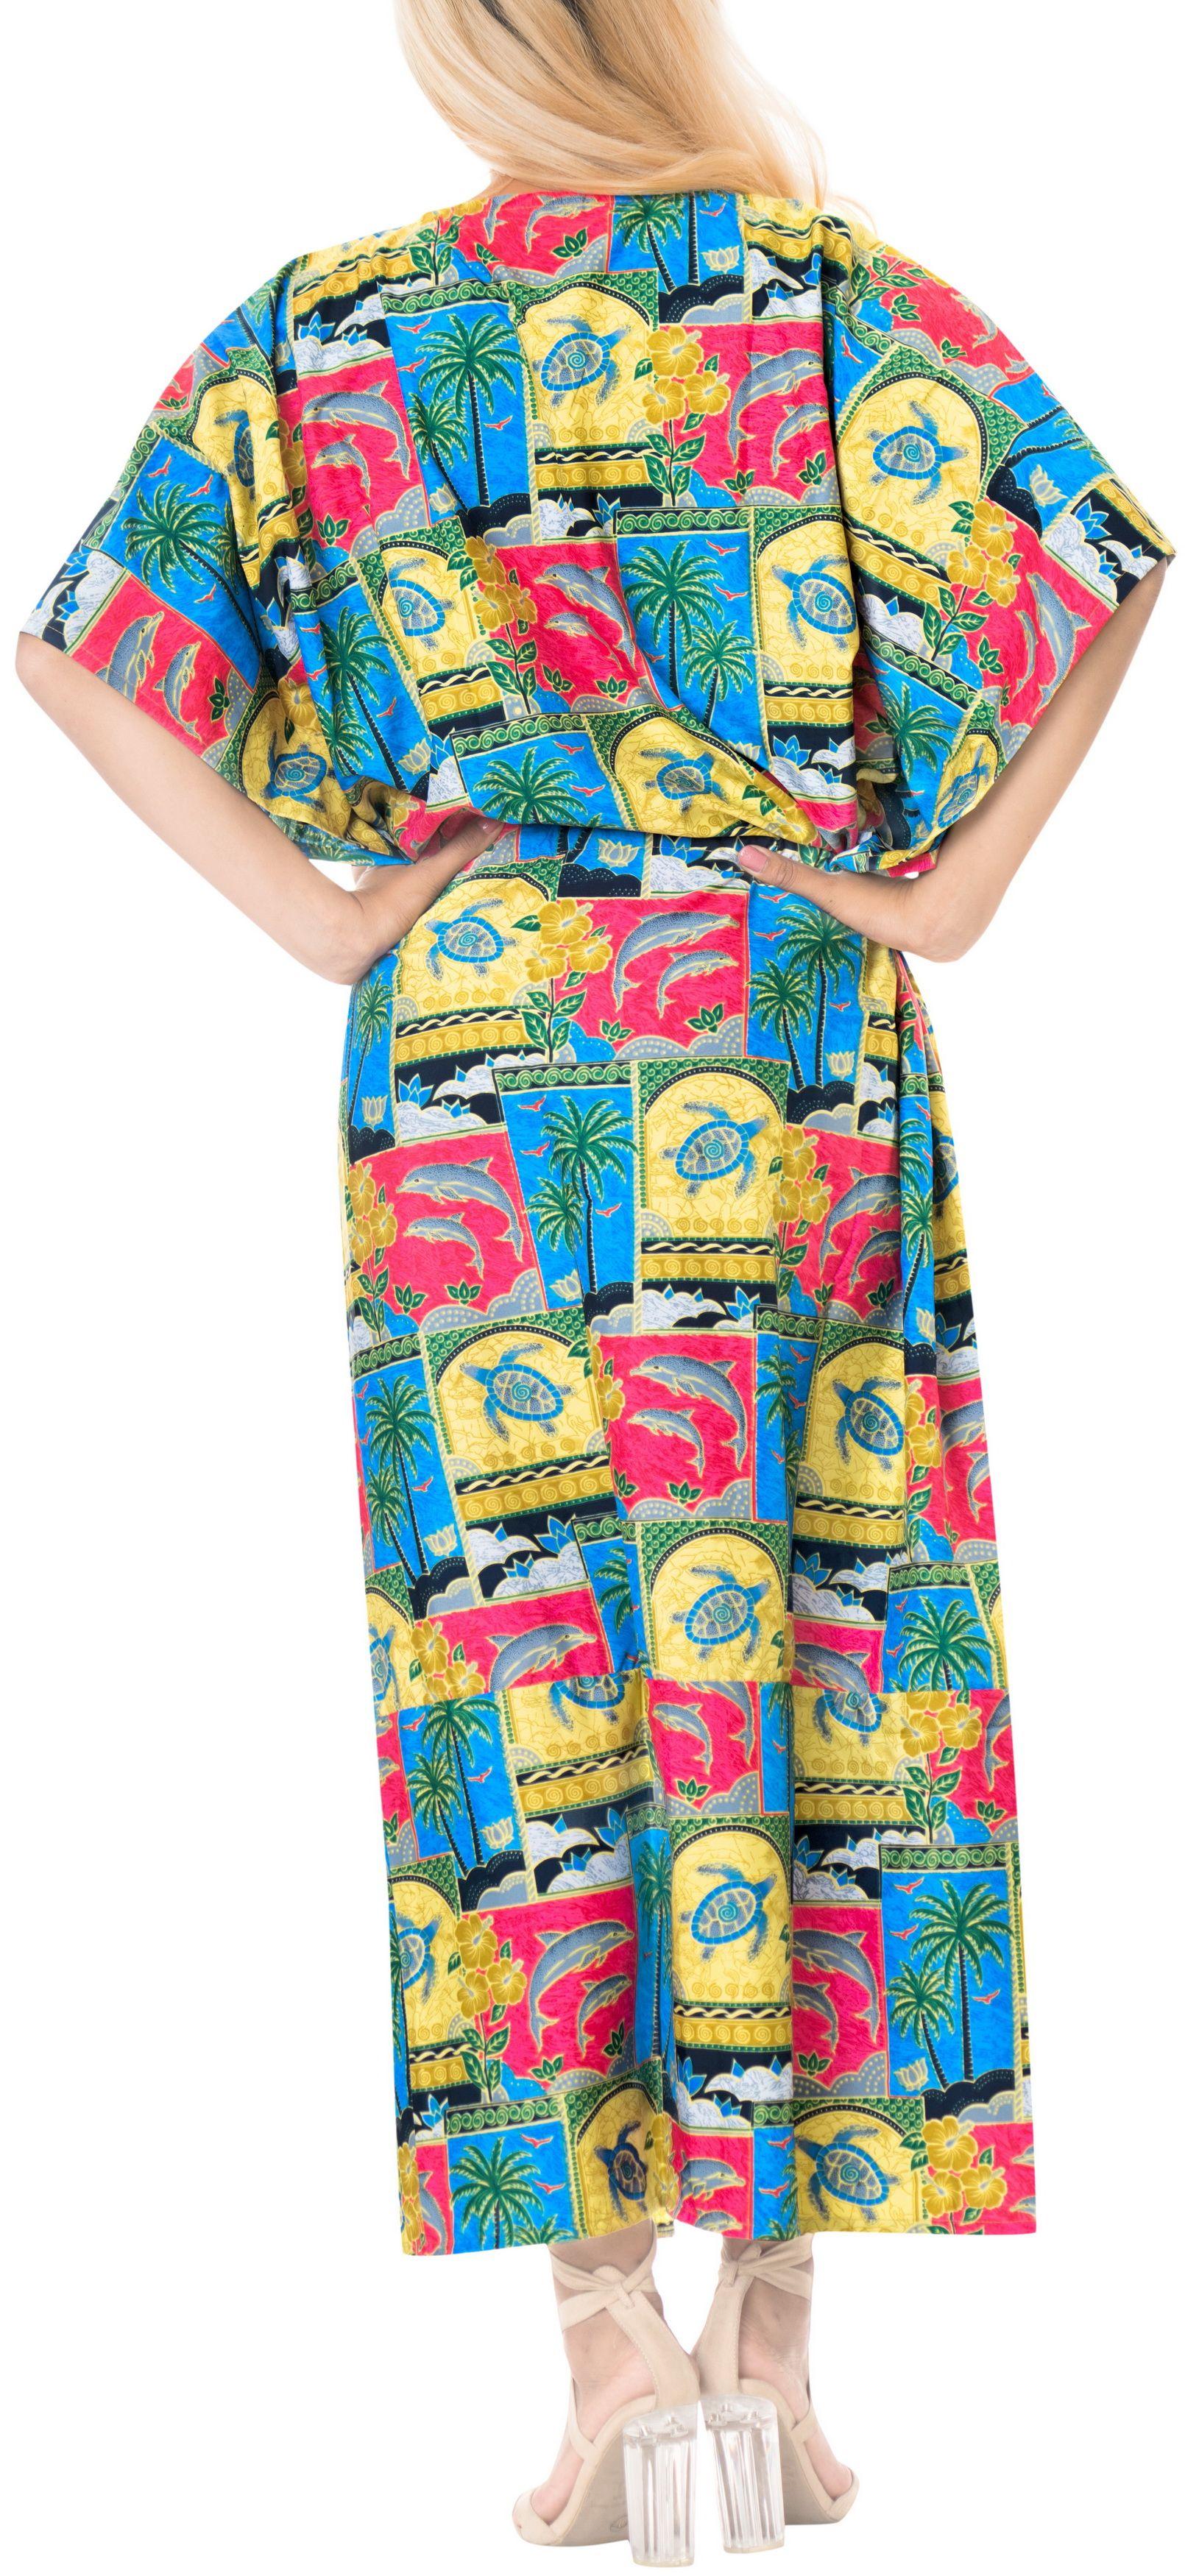 e940daa34b3 Women s Long Caftan dress beach wear Loose Lounger Cover up Night wear  Kimono dress